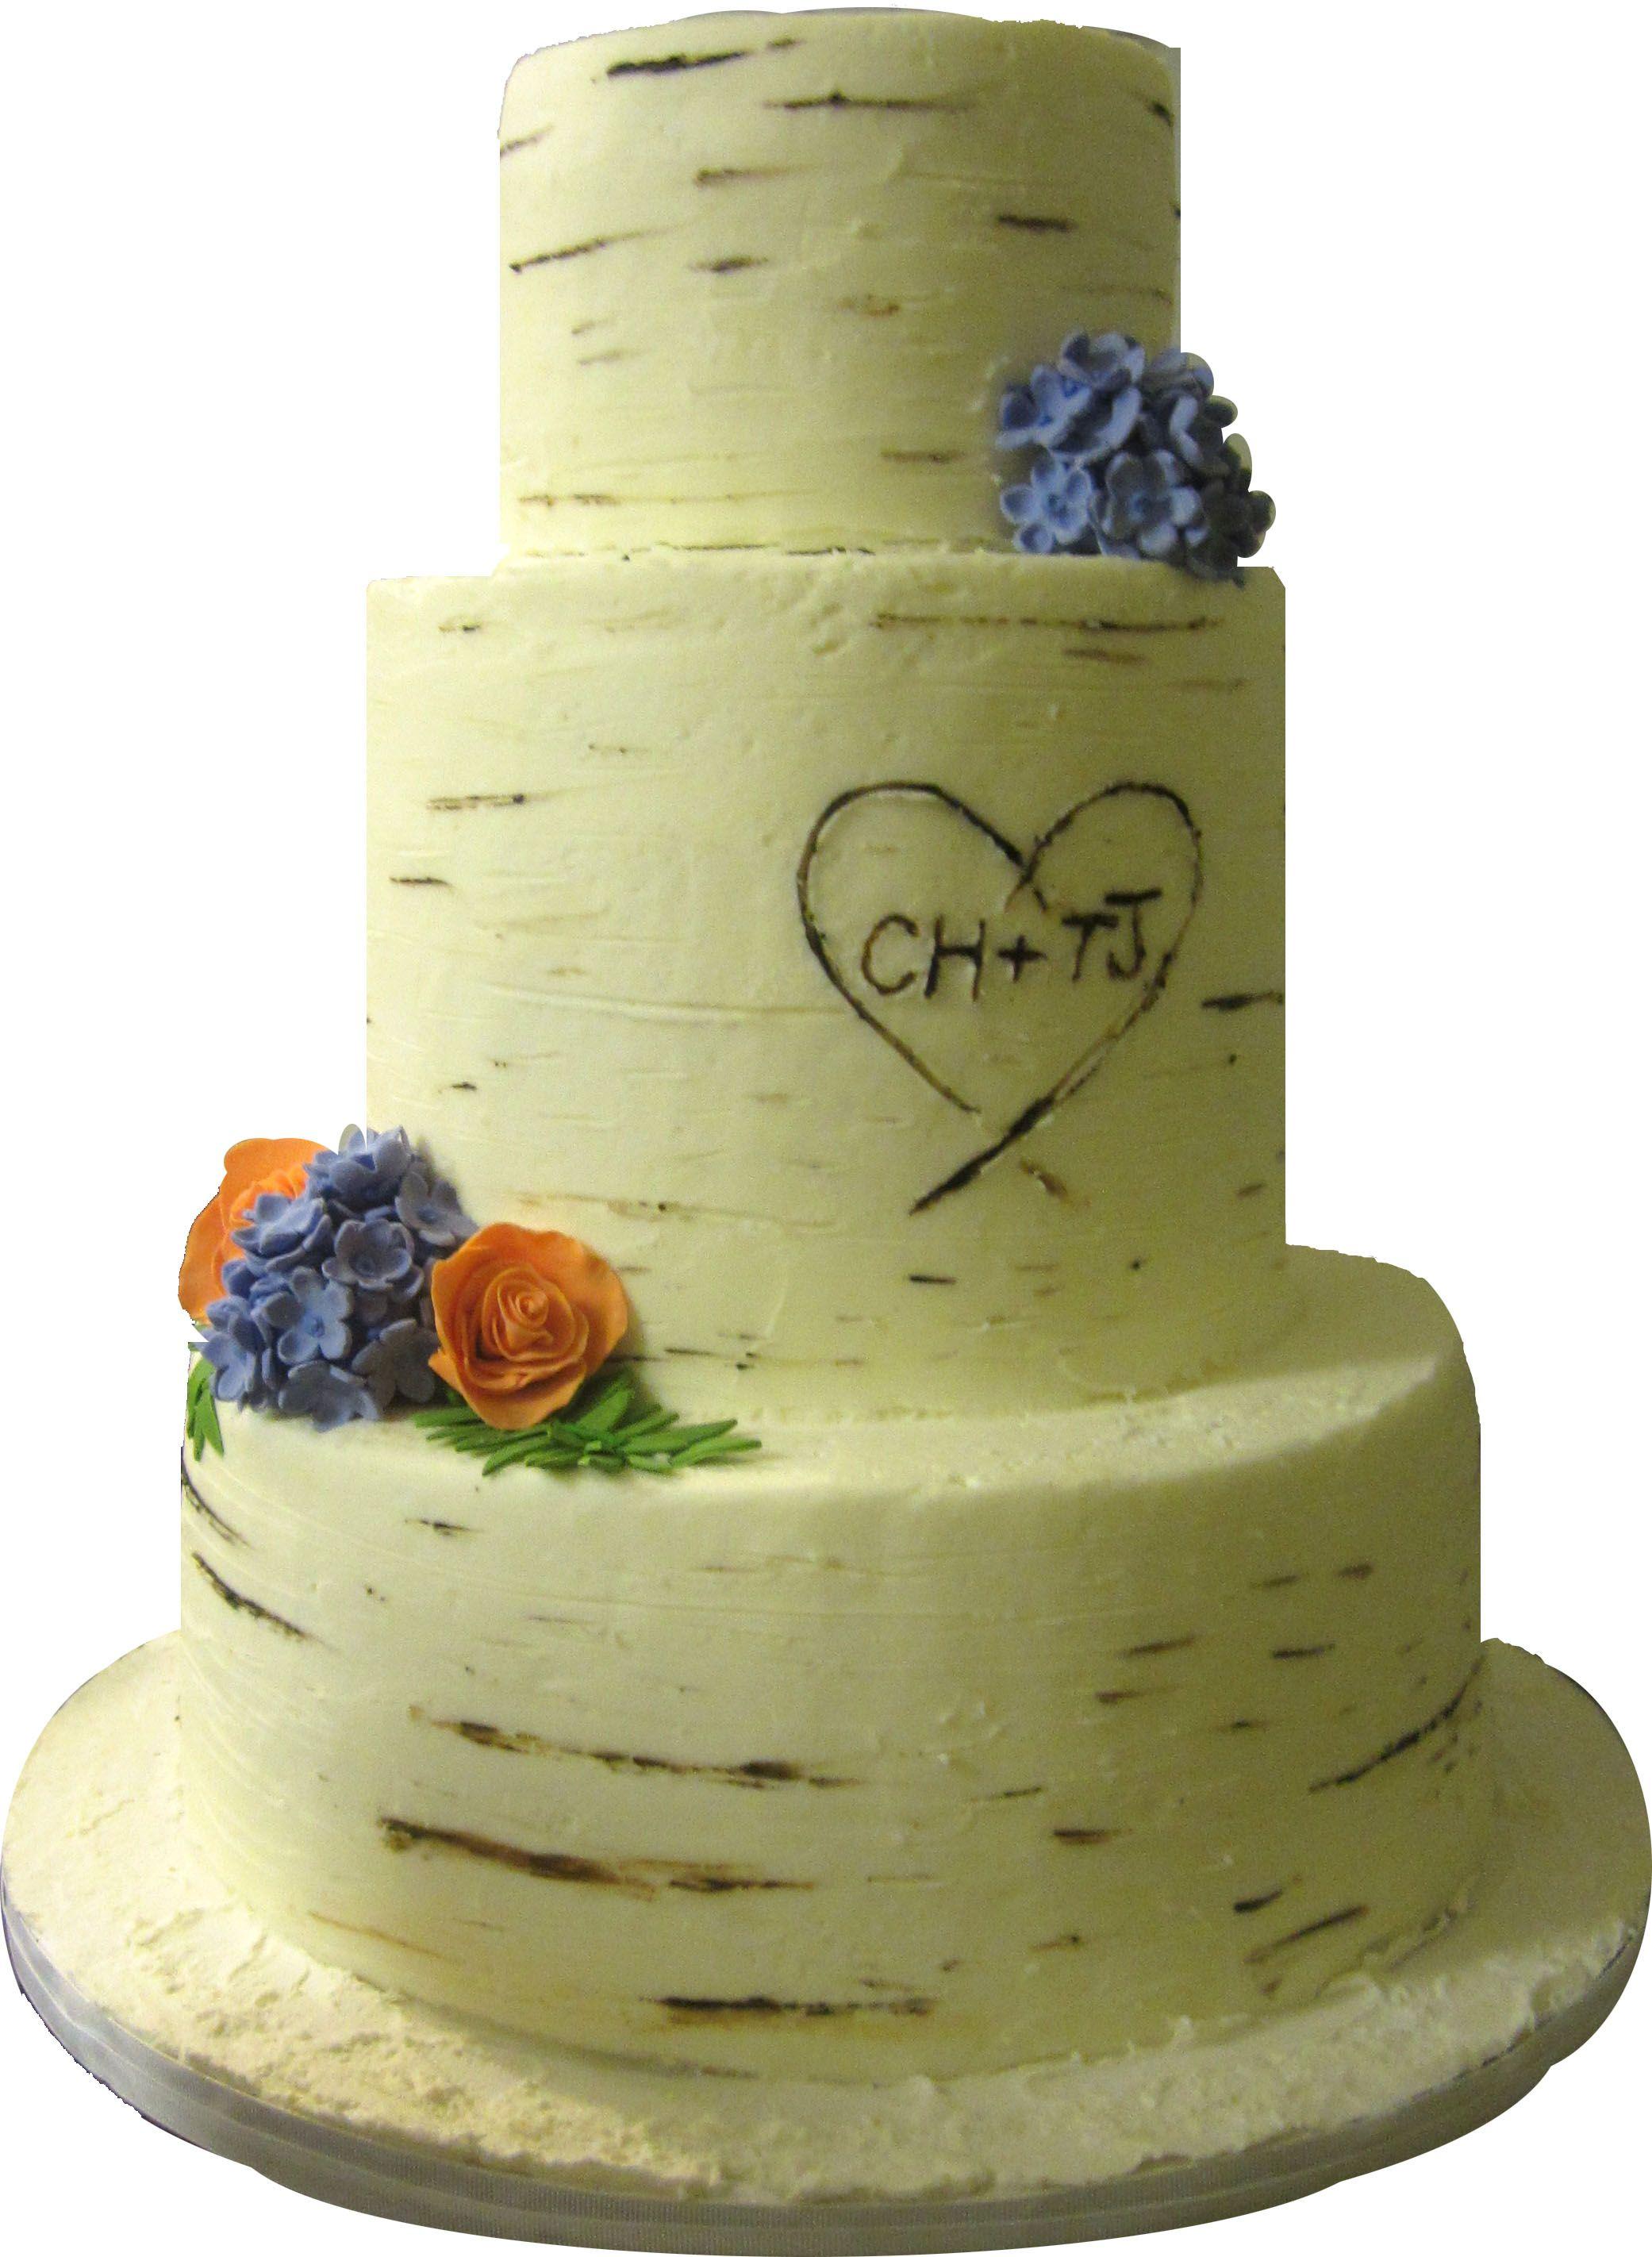 birch tree wedding cake richmond va | decorated cakes | Pinterest